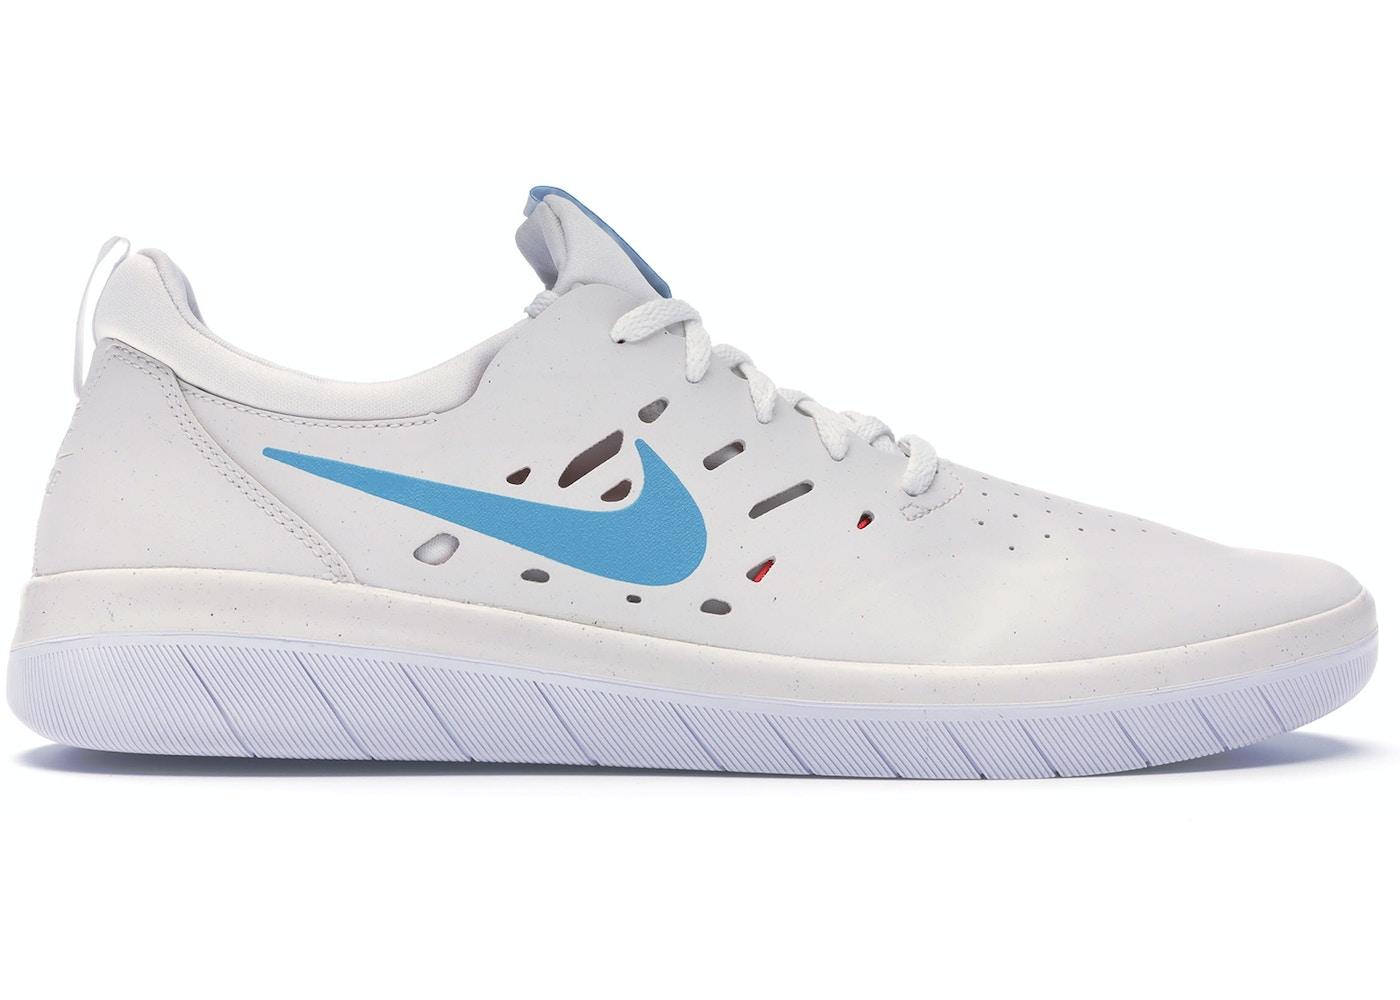 0acd868e5c4 Nike SB Nyjah Summit White Light Blue Fury - AA4272-101